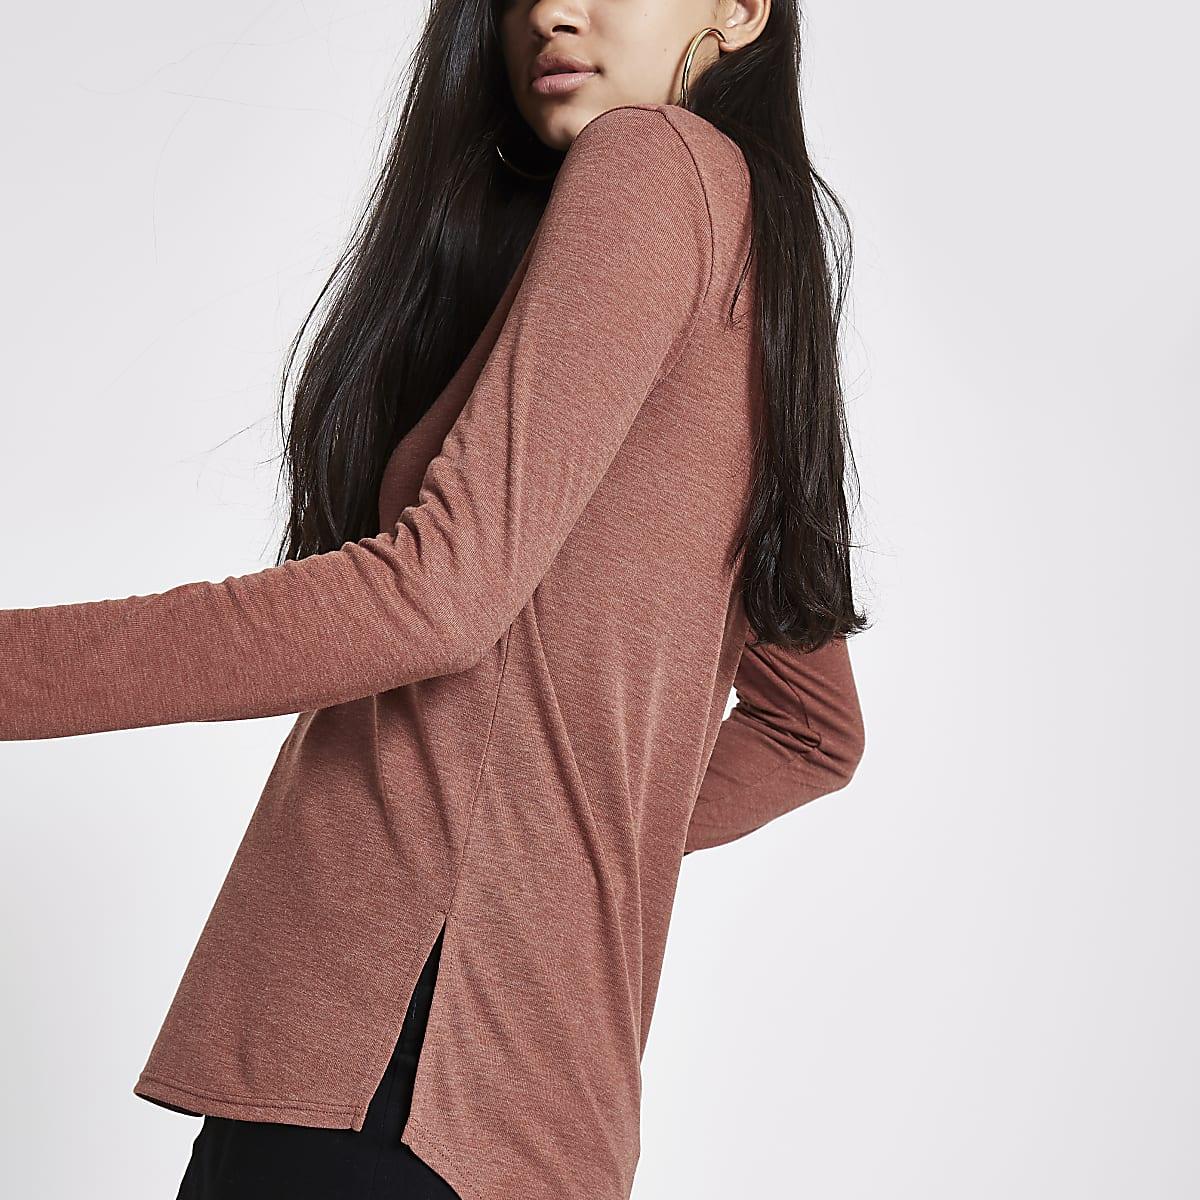 Light brown basic scoop neck long sleeve top